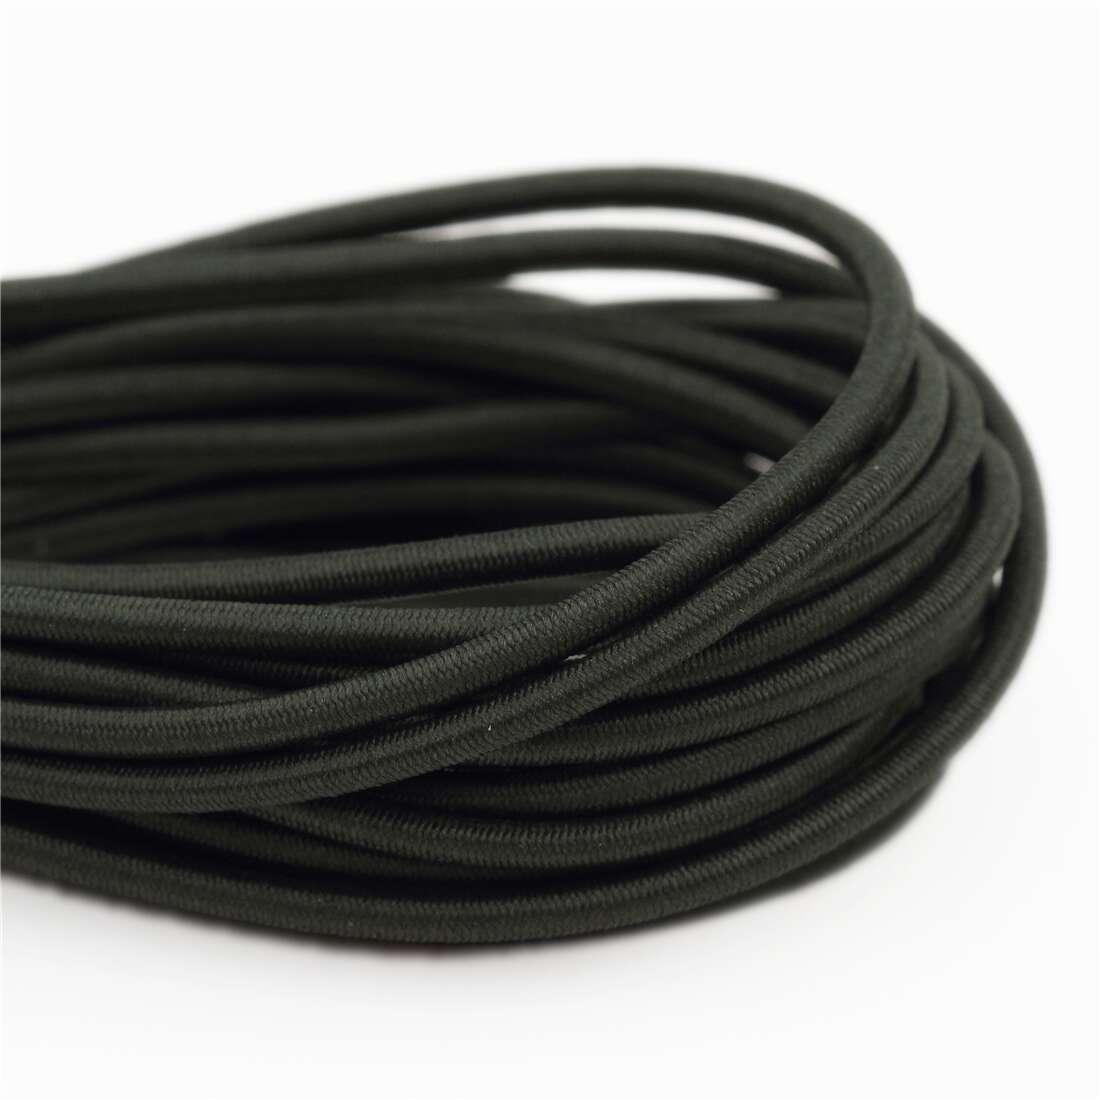 1m Dark Green Elastic Cord Modes4u